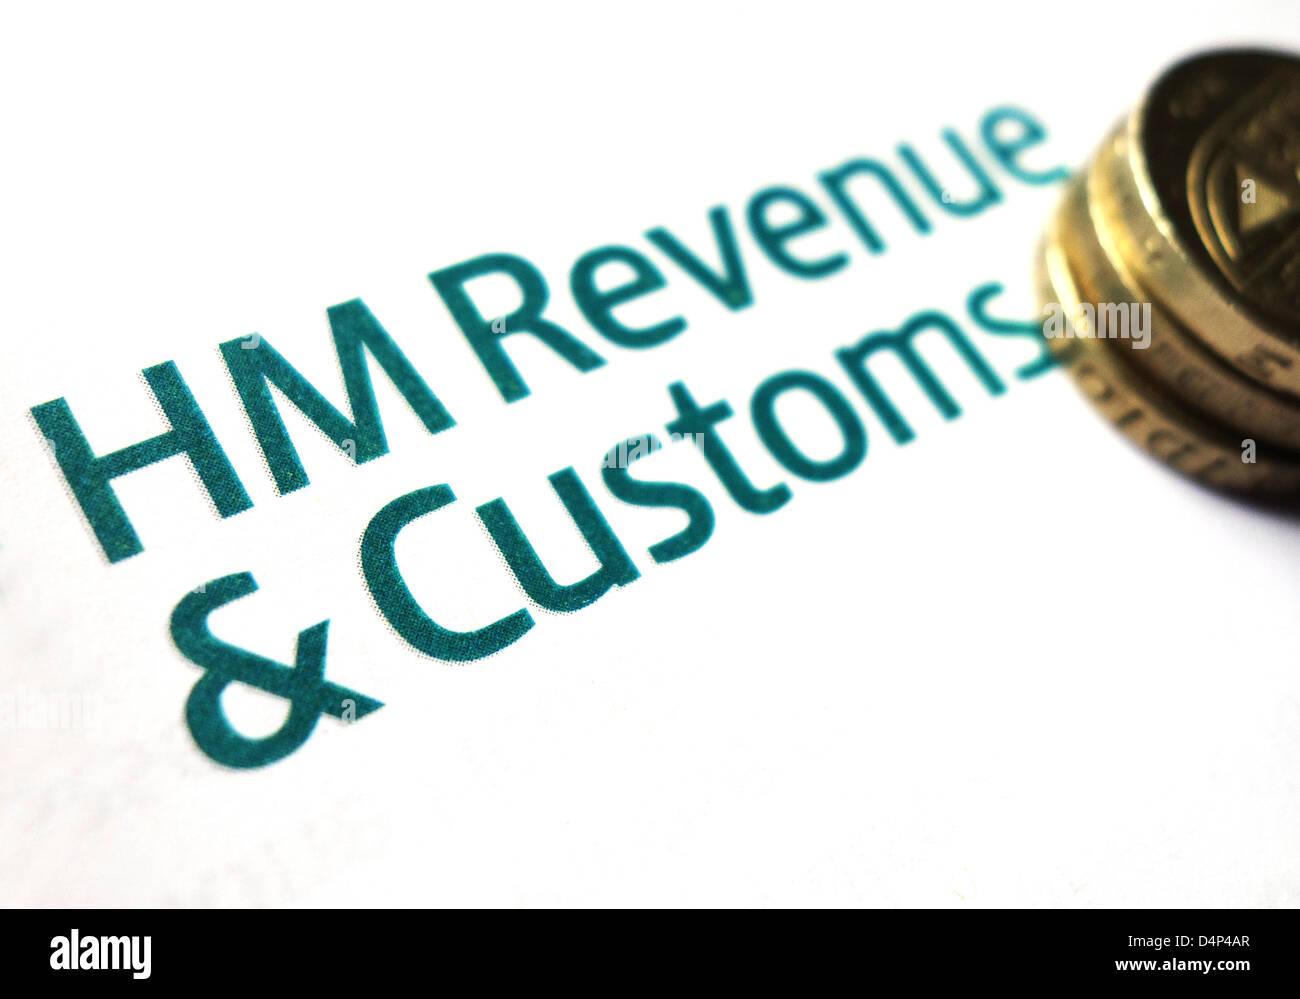 HM revenue and customs logo - Stock Image